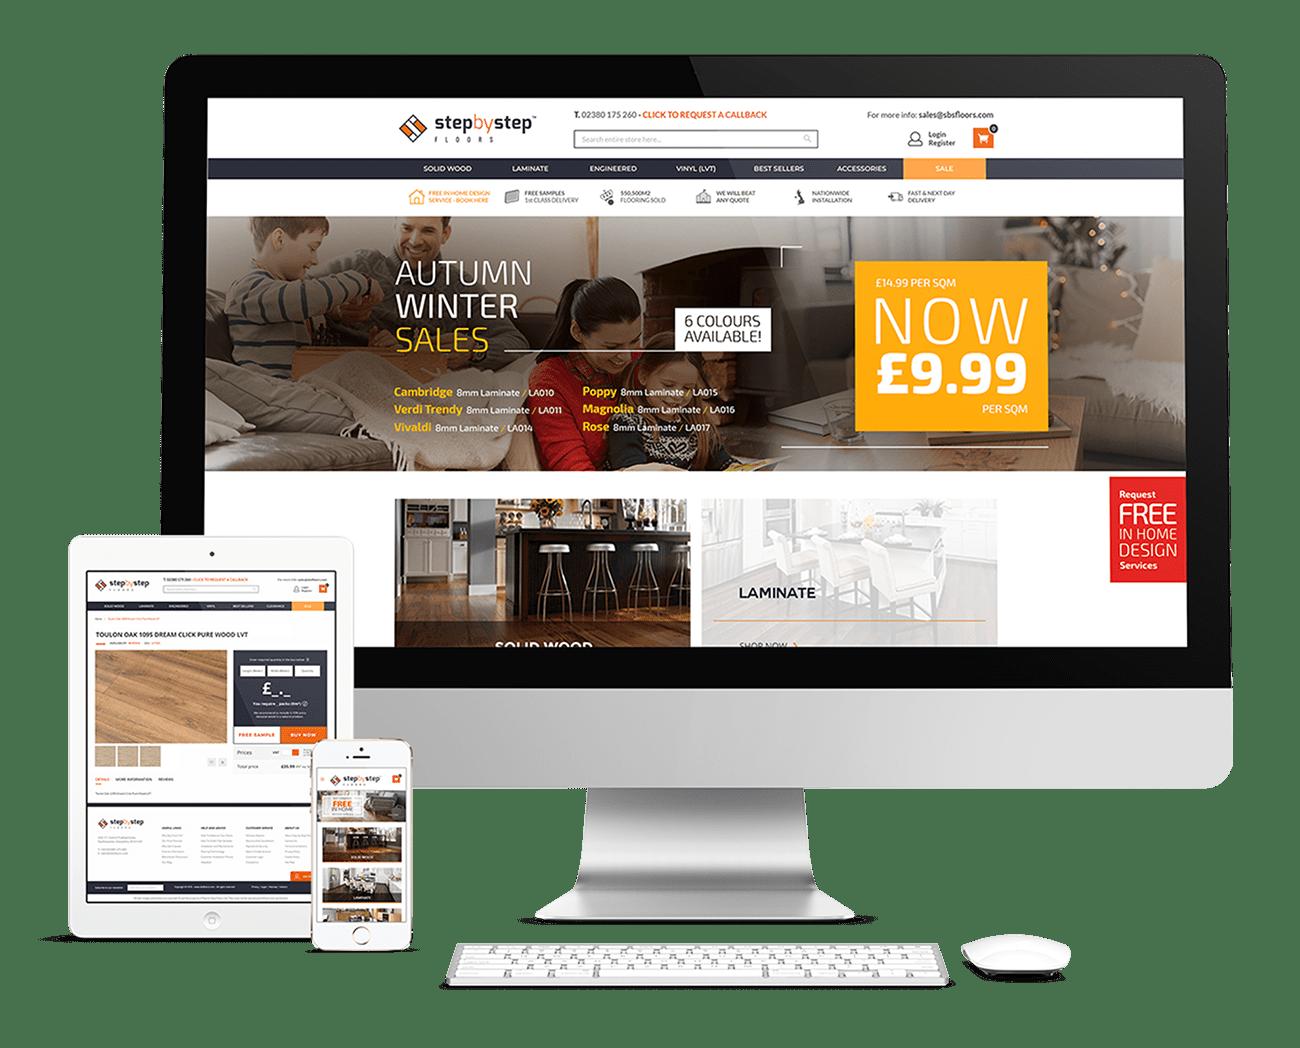 9 Benefits of Choosing Woocommerce Development for Your E-commerce Website